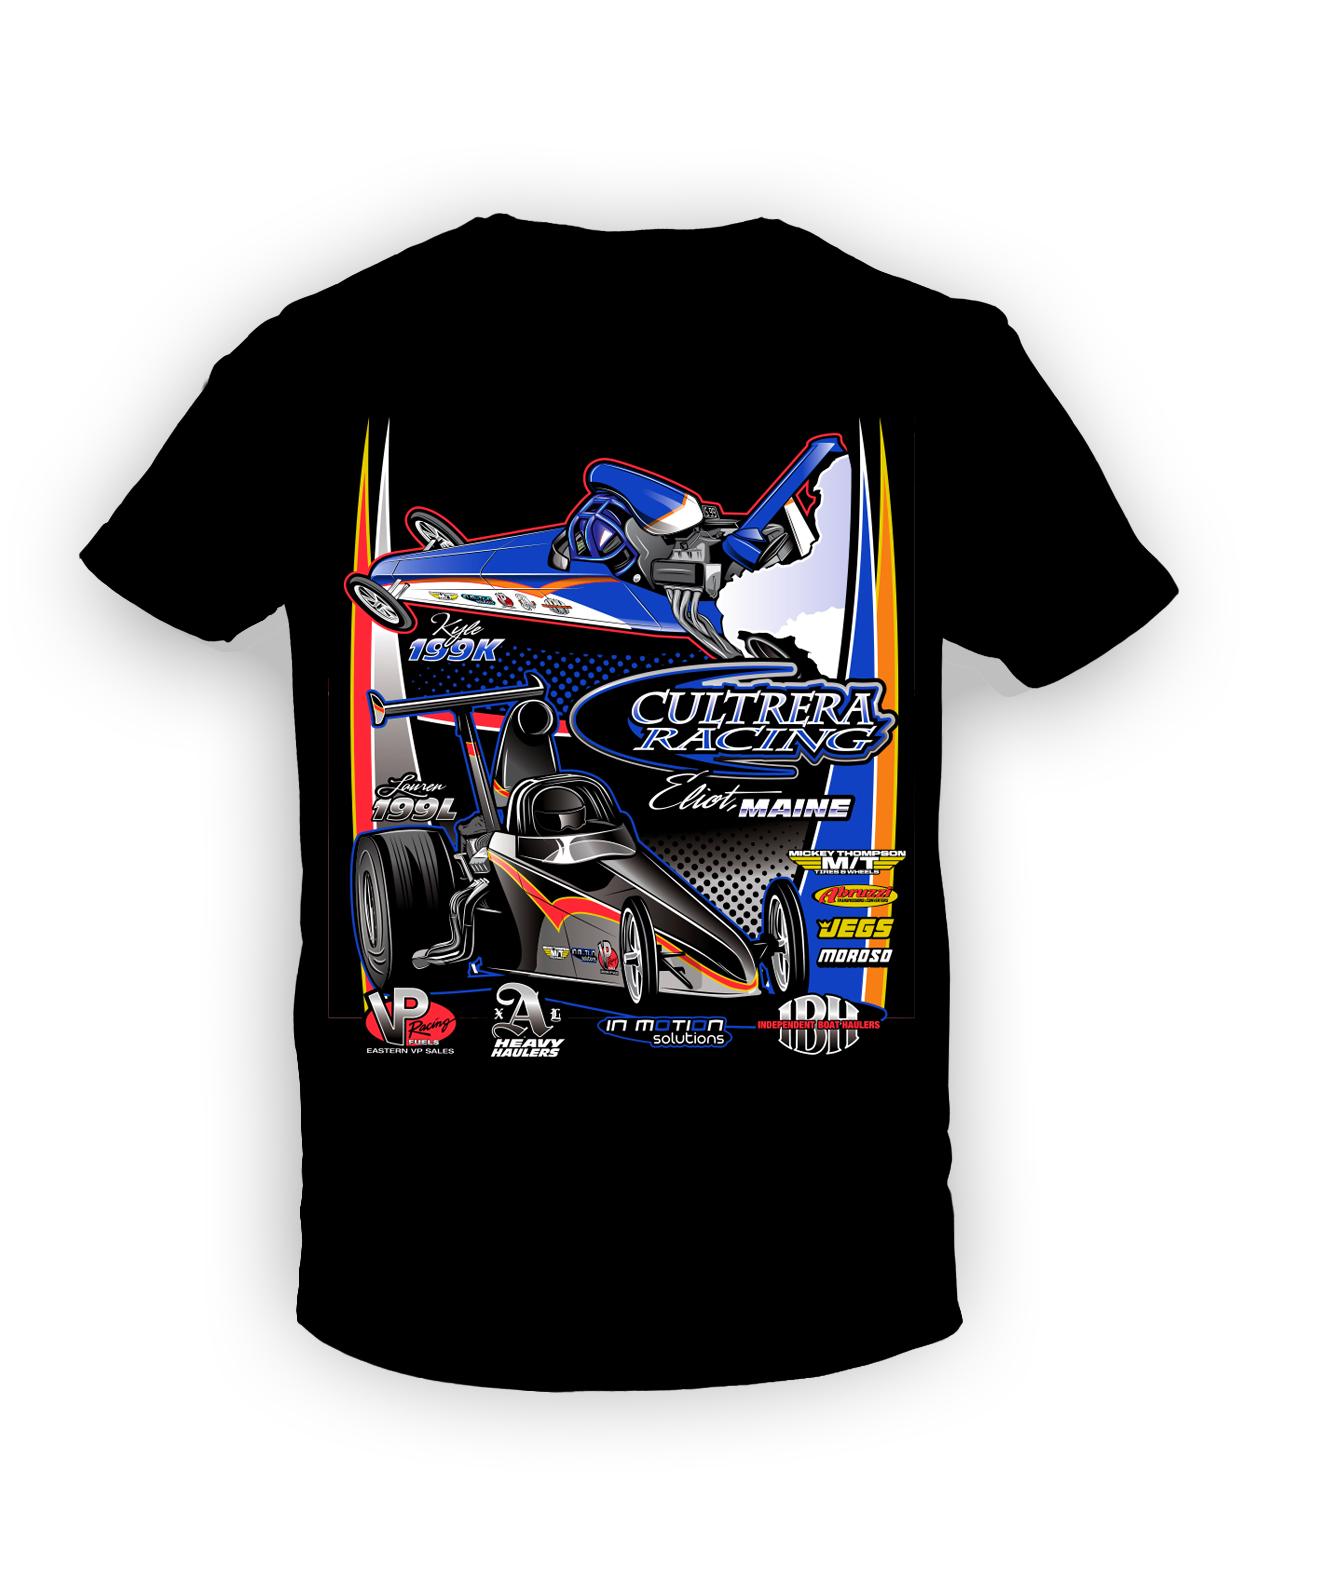 t shirt design cultrera racing nhra top dragster in